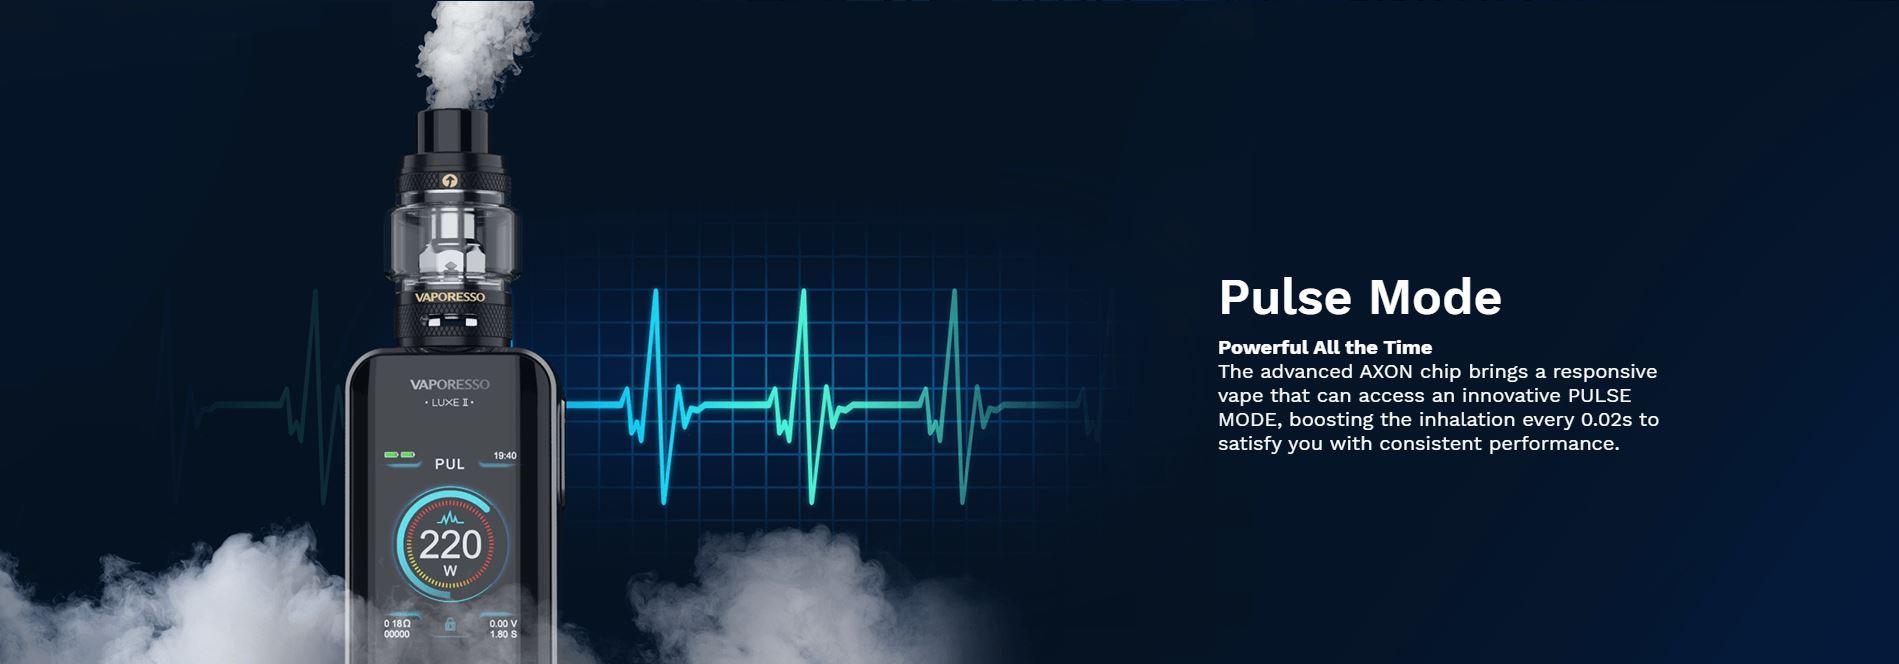 Modo Pulse